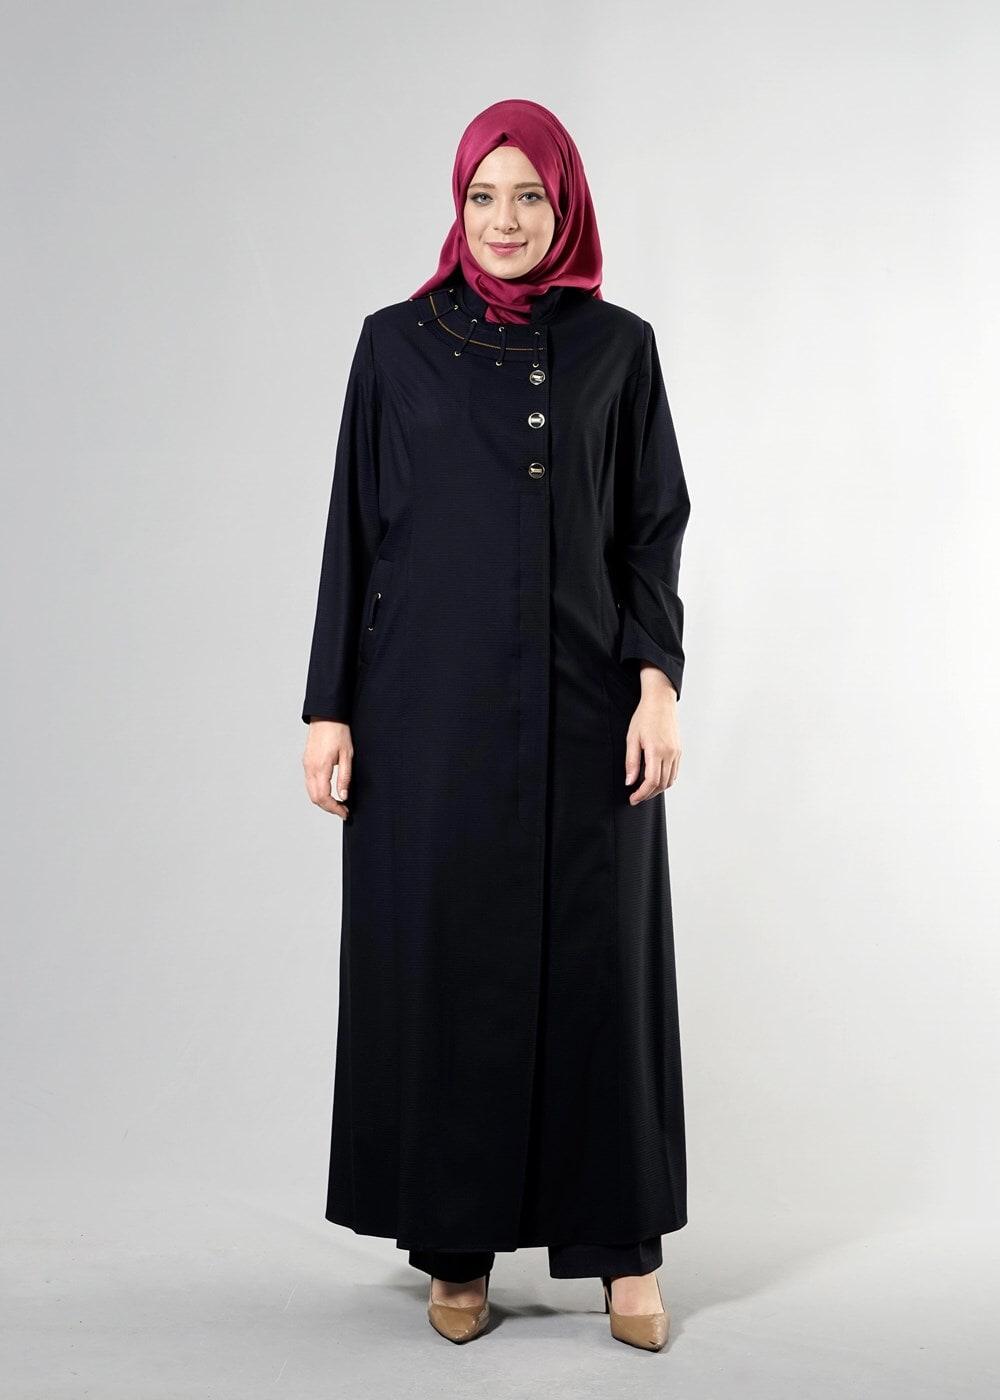 Femelle BLEU MARINE T 1514-1 Ekose Tesettür Pardesü-Alv Fashion